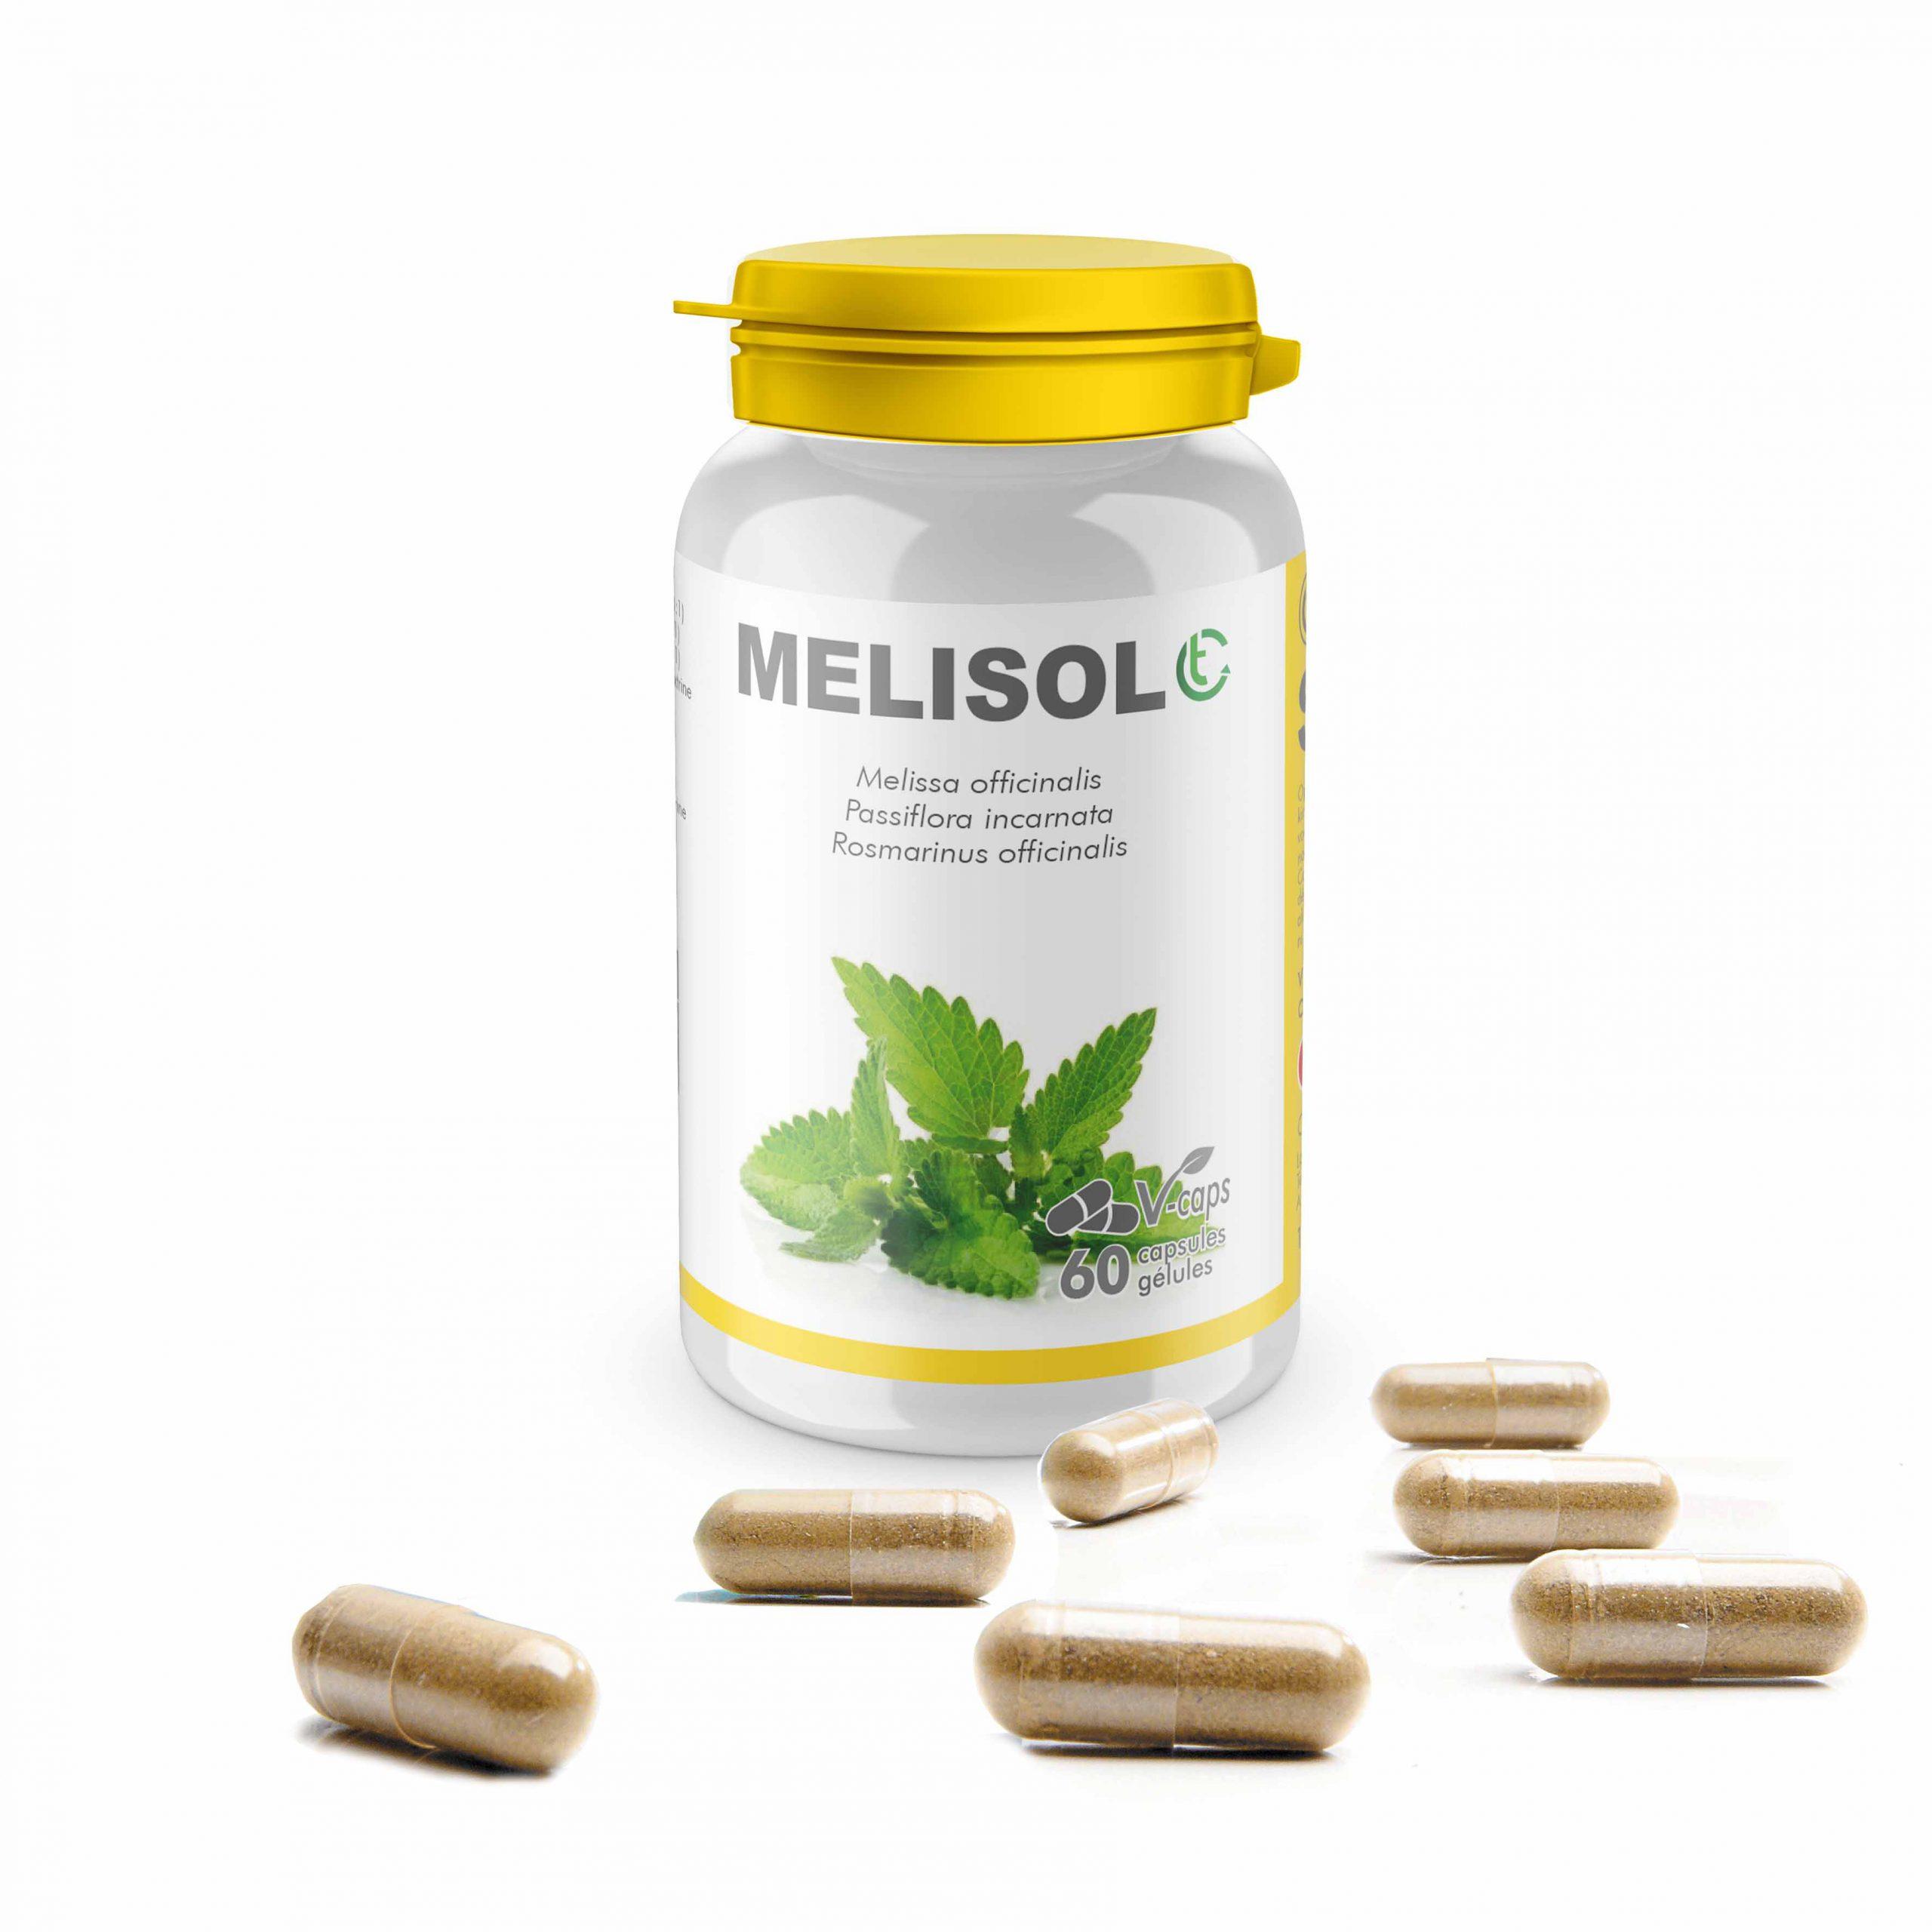 Melisol CT